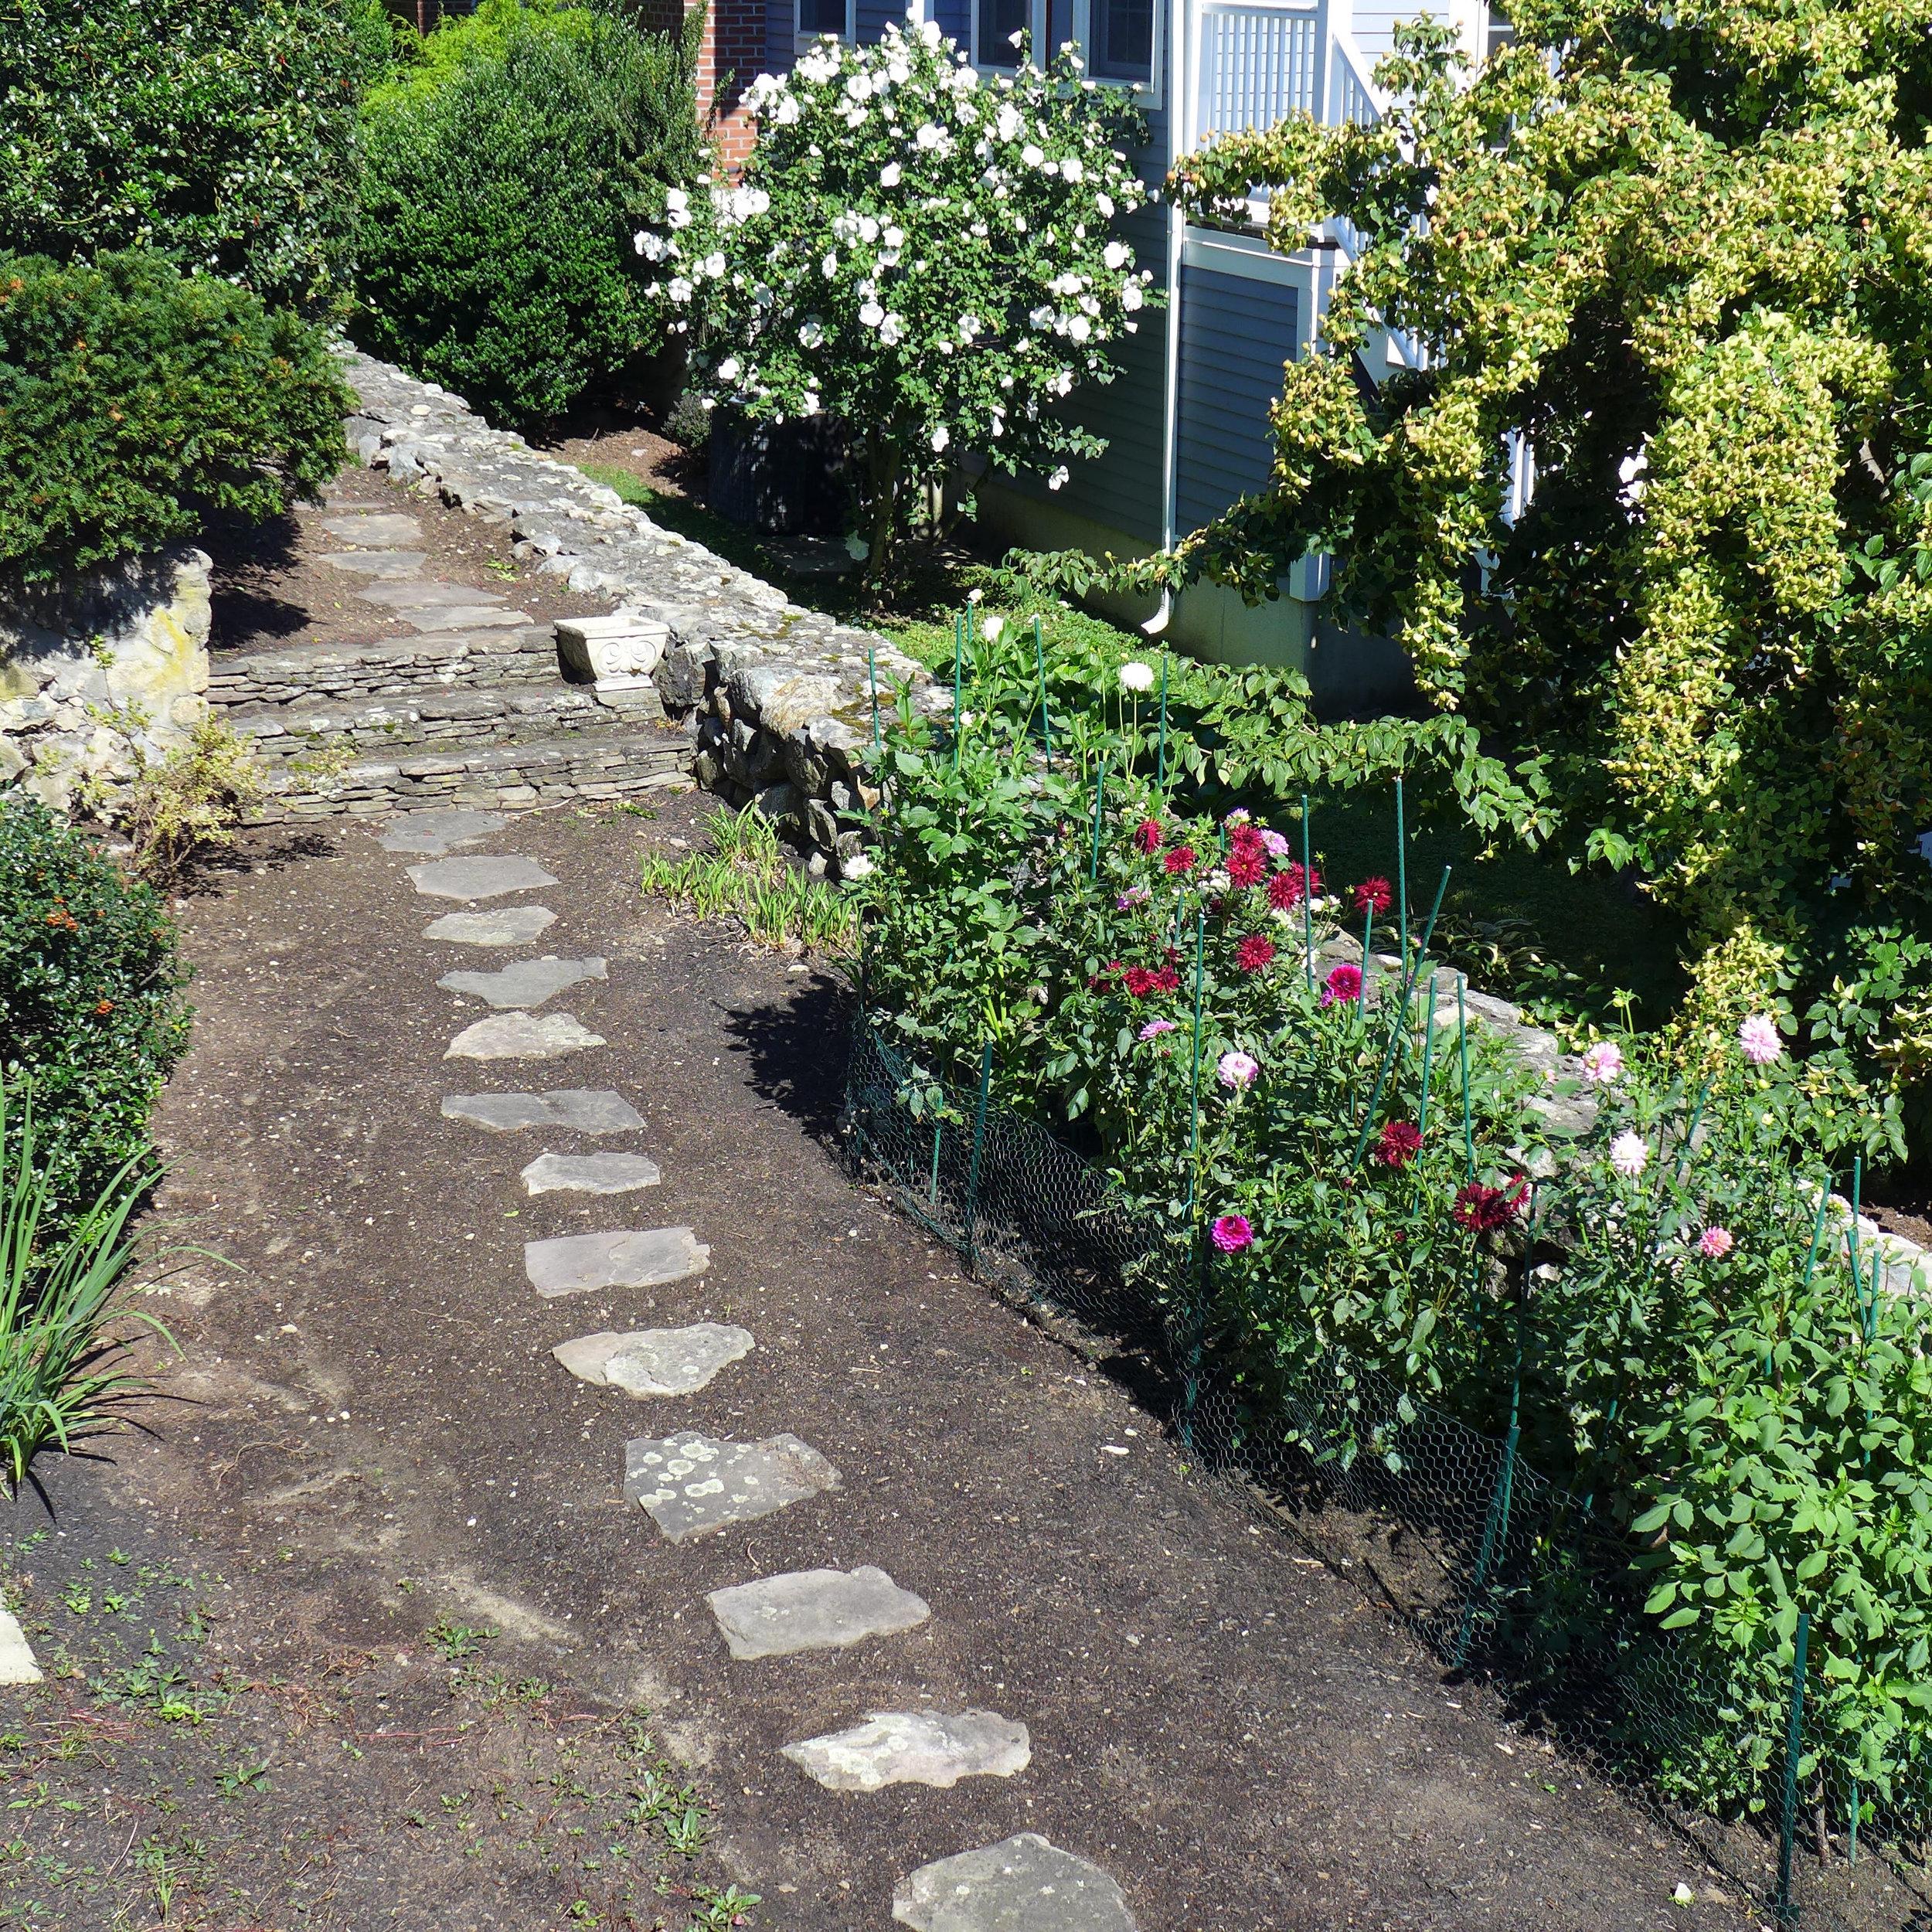 Dahlia bed and stone walk.jpg